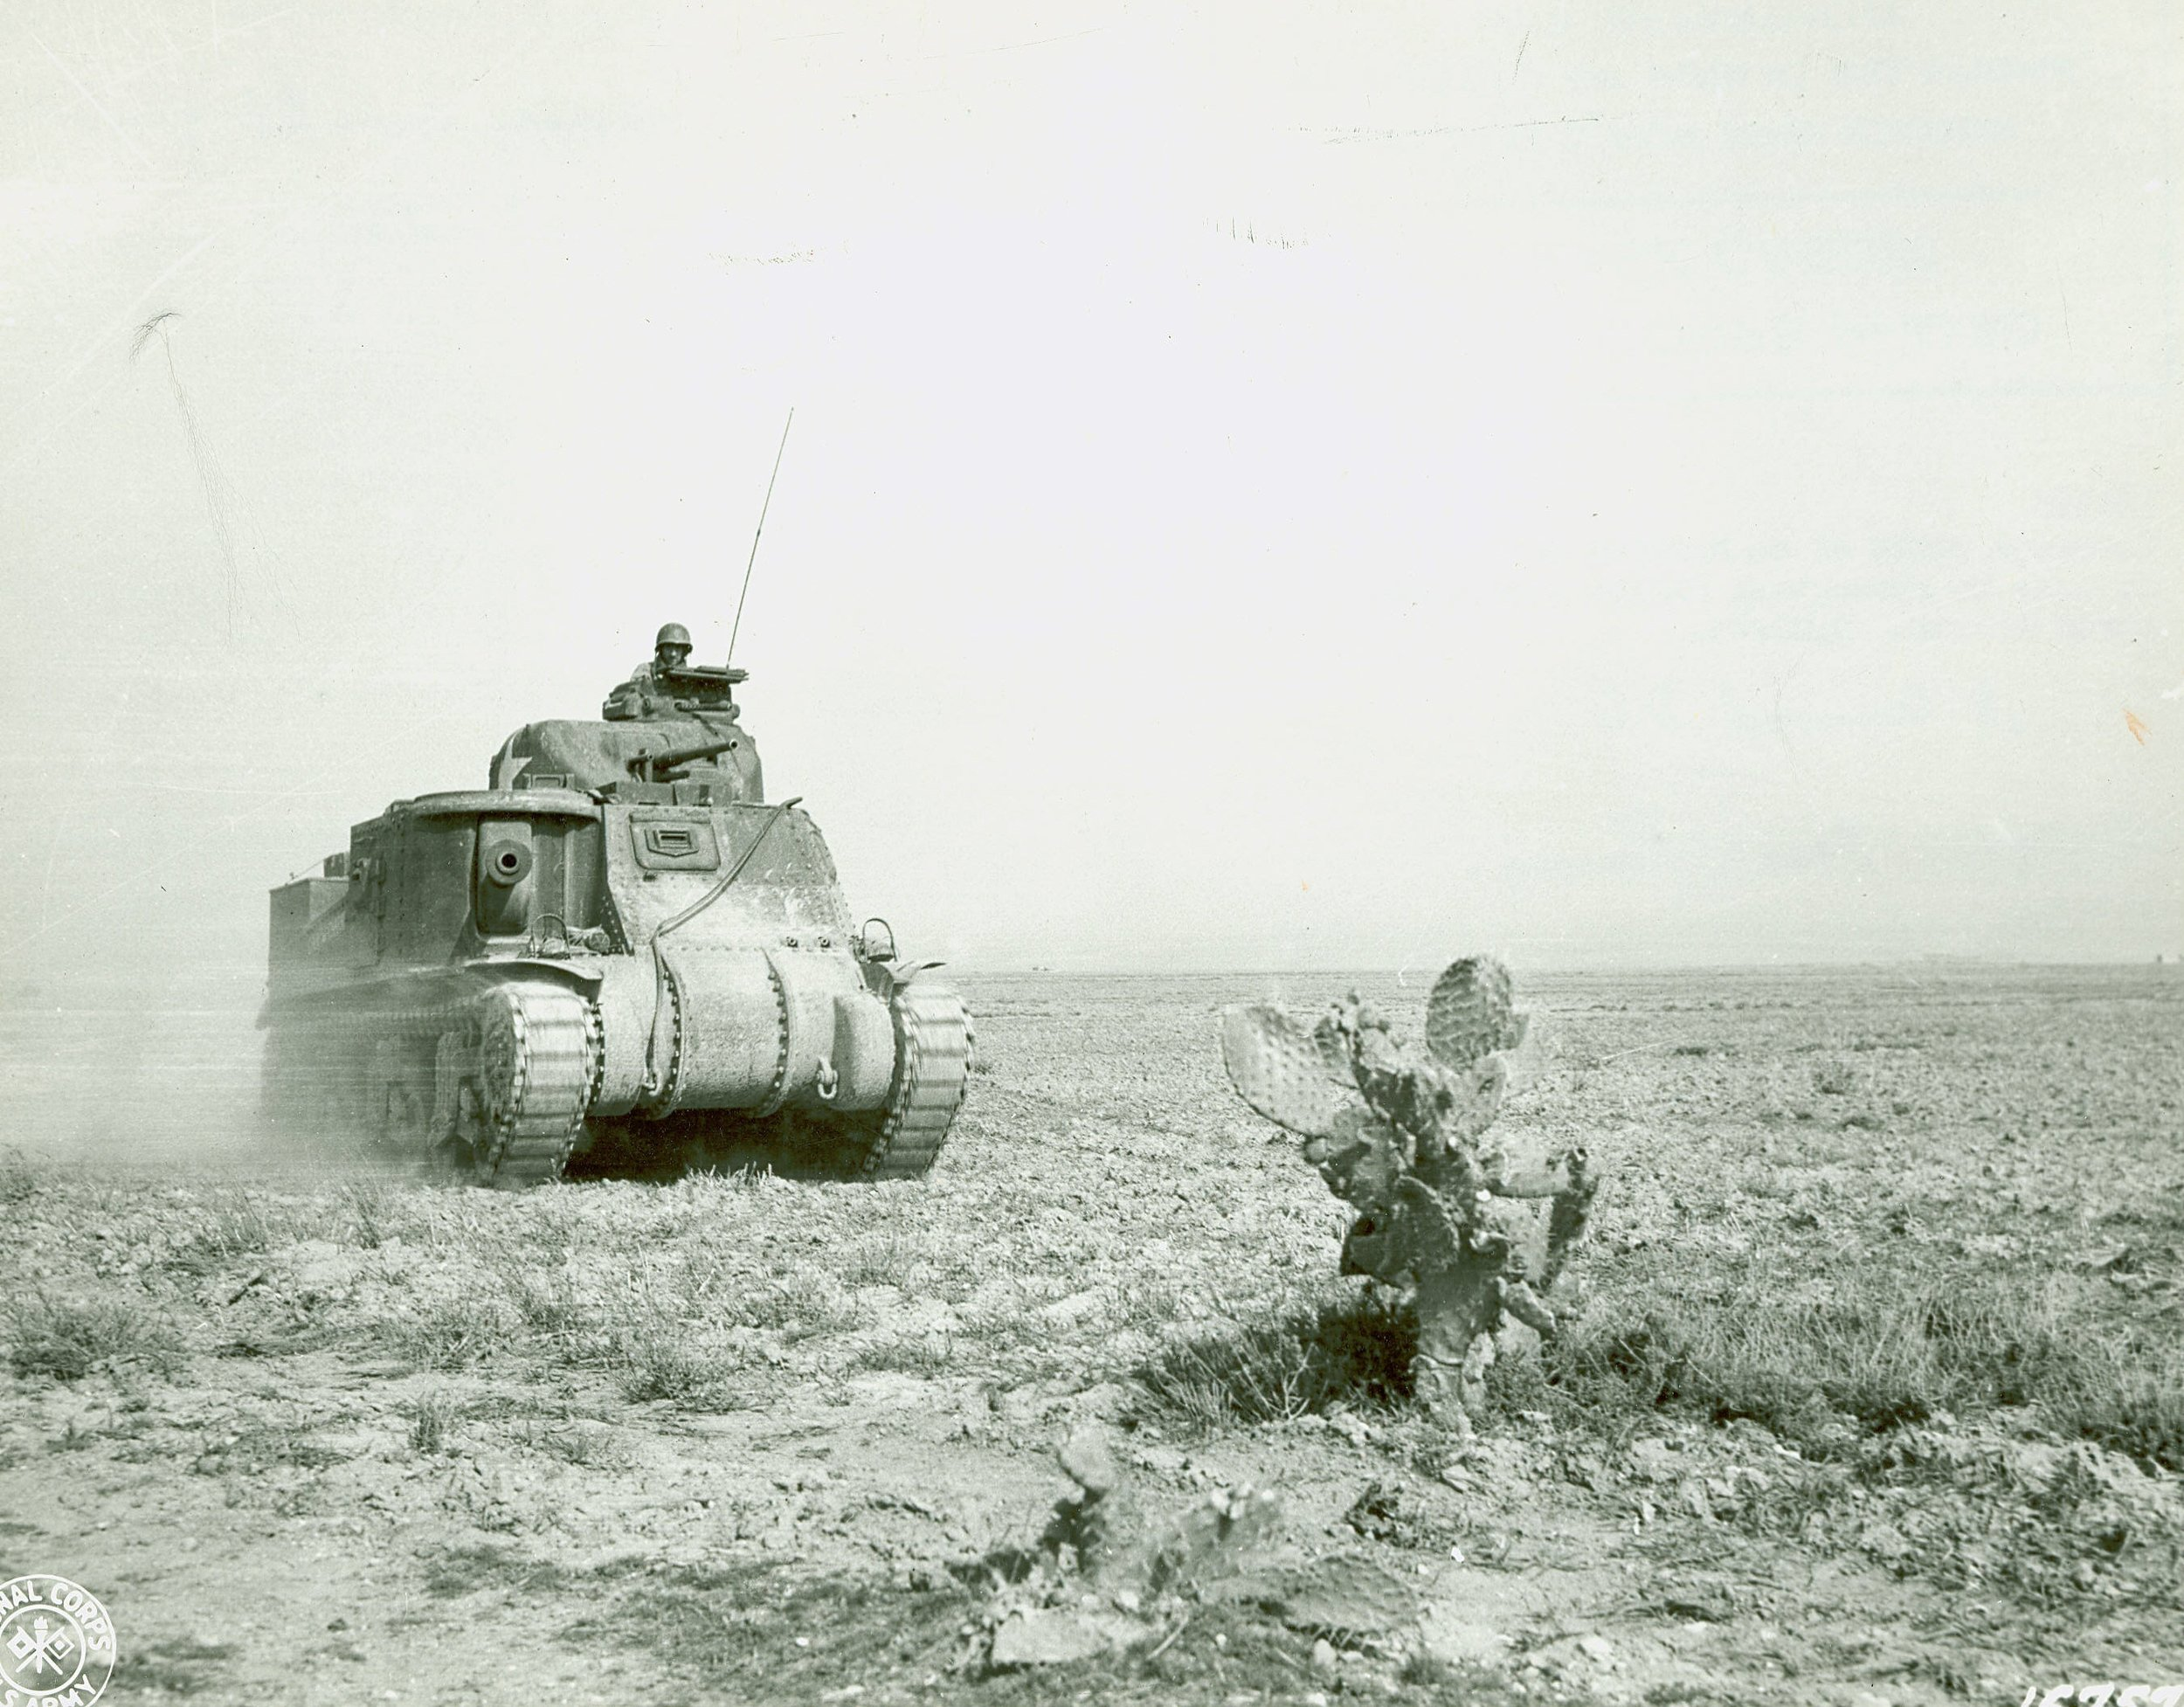 M3 Lee near Kasserine Pass,Tunisia, late Feb 1943.